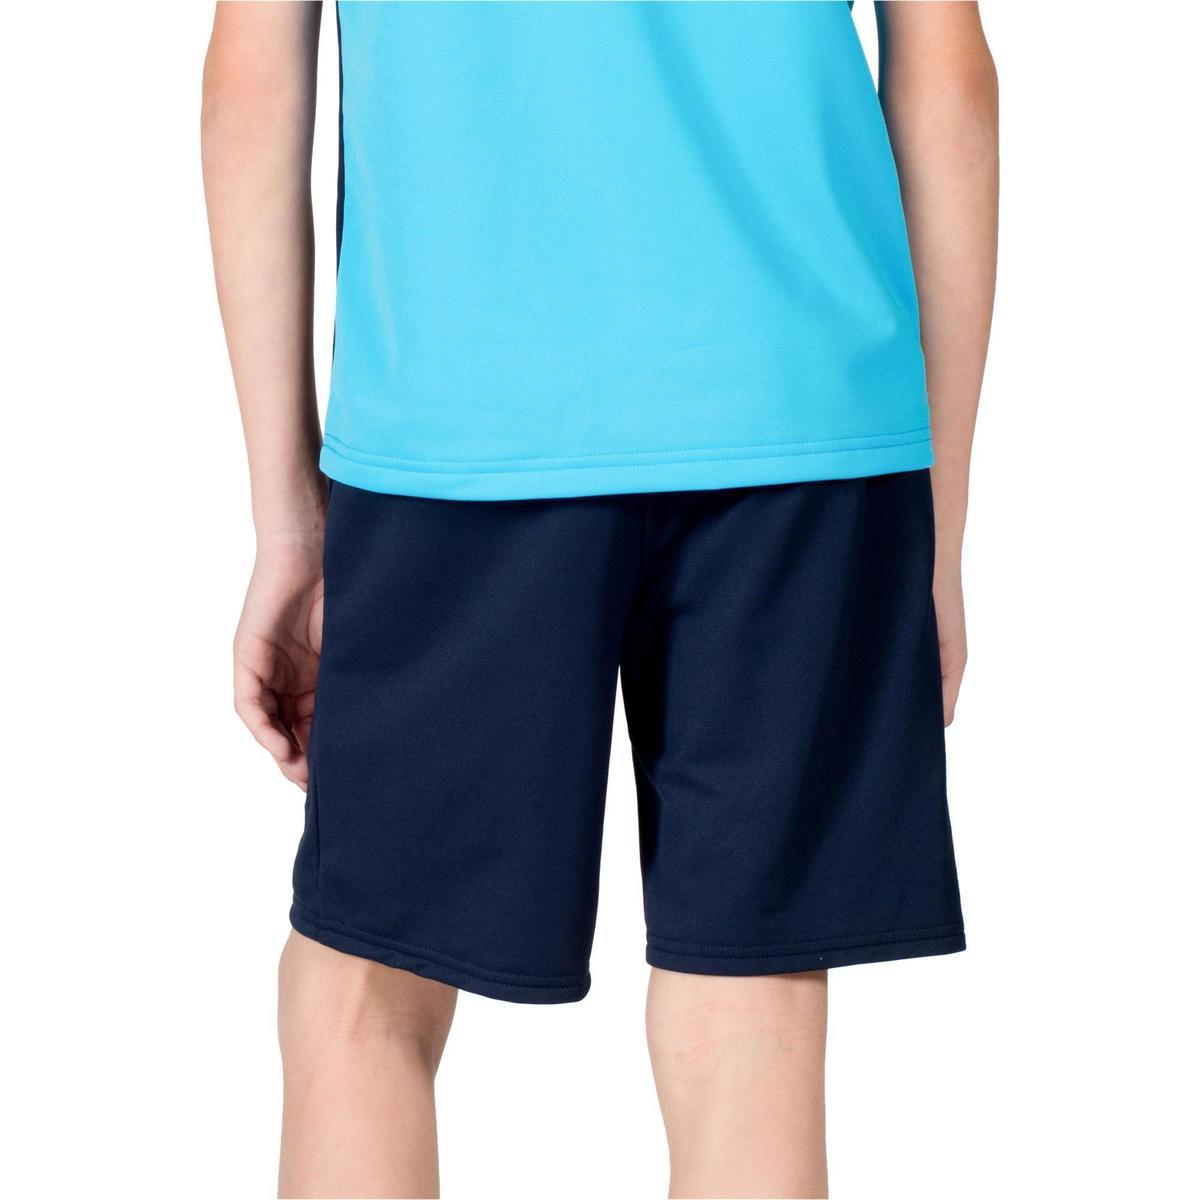 Bild 5 von Feldhockey-Shorts FH100 Kinder hellblau/dunkelblau